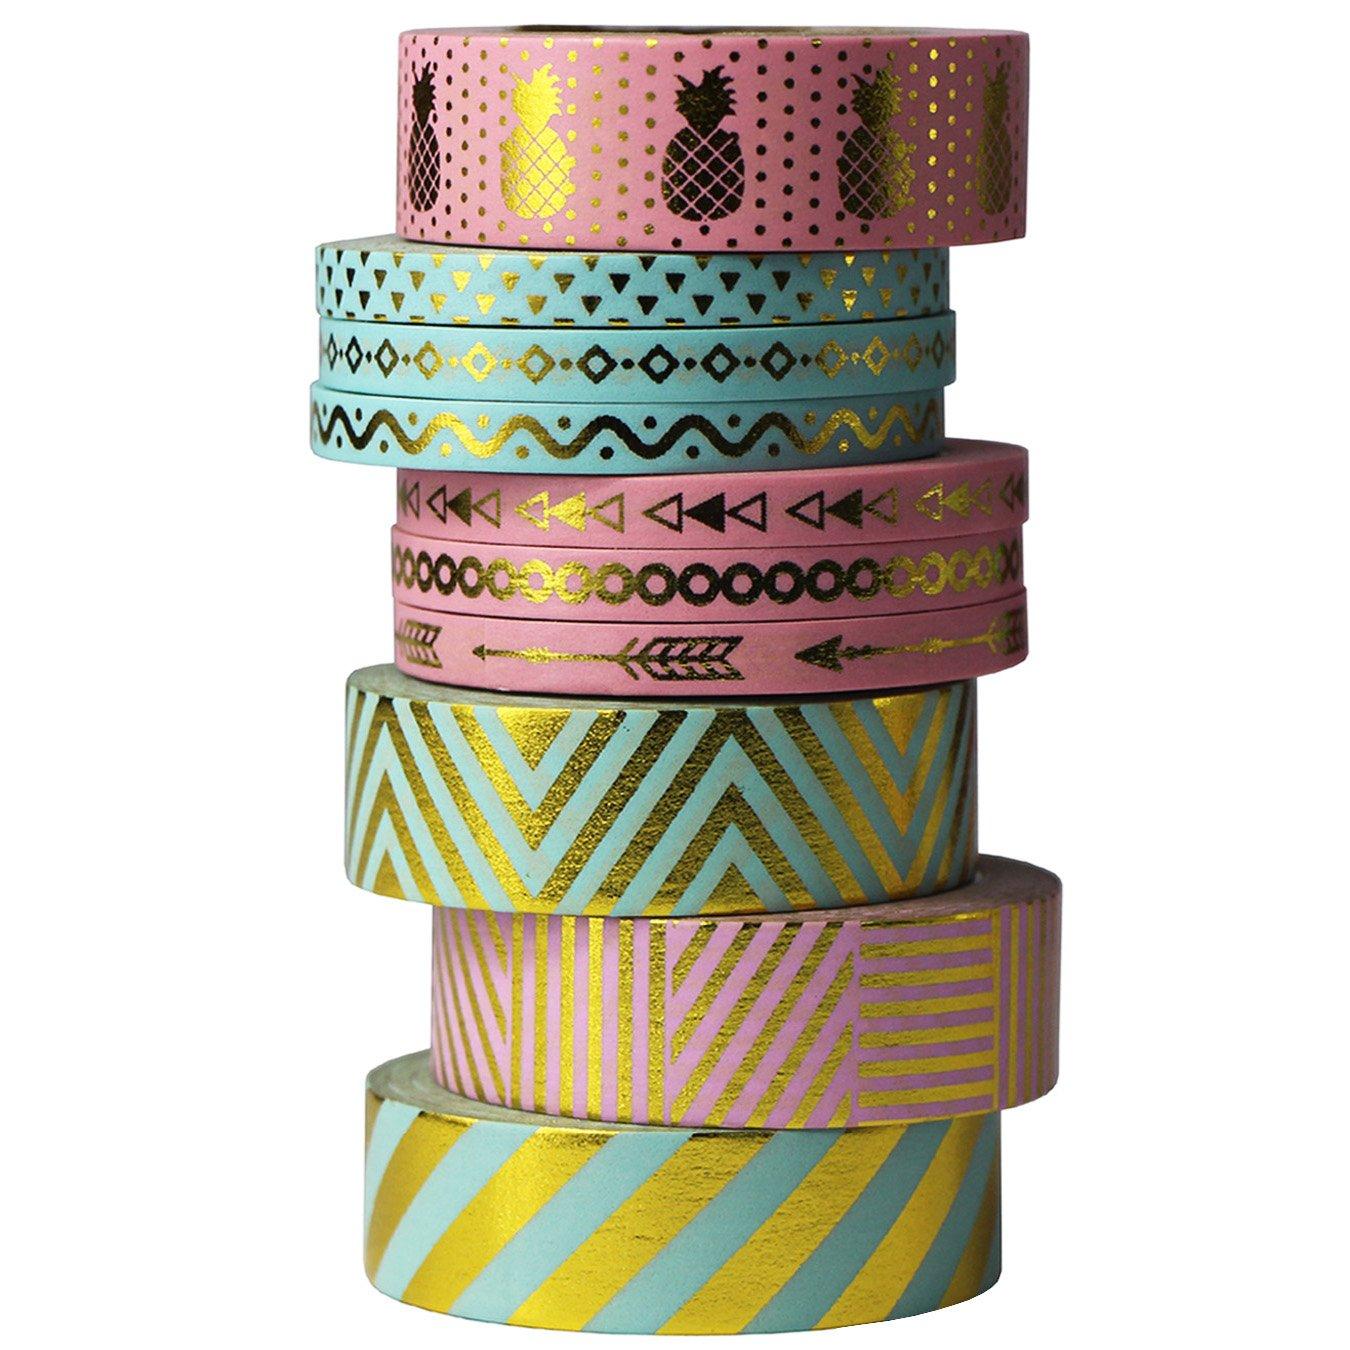 UOOOM 10 Rouleaux Washi Tape Ruban Adhésif Papier Décoratif Masking Tape Scrapbooking (Design 9063)